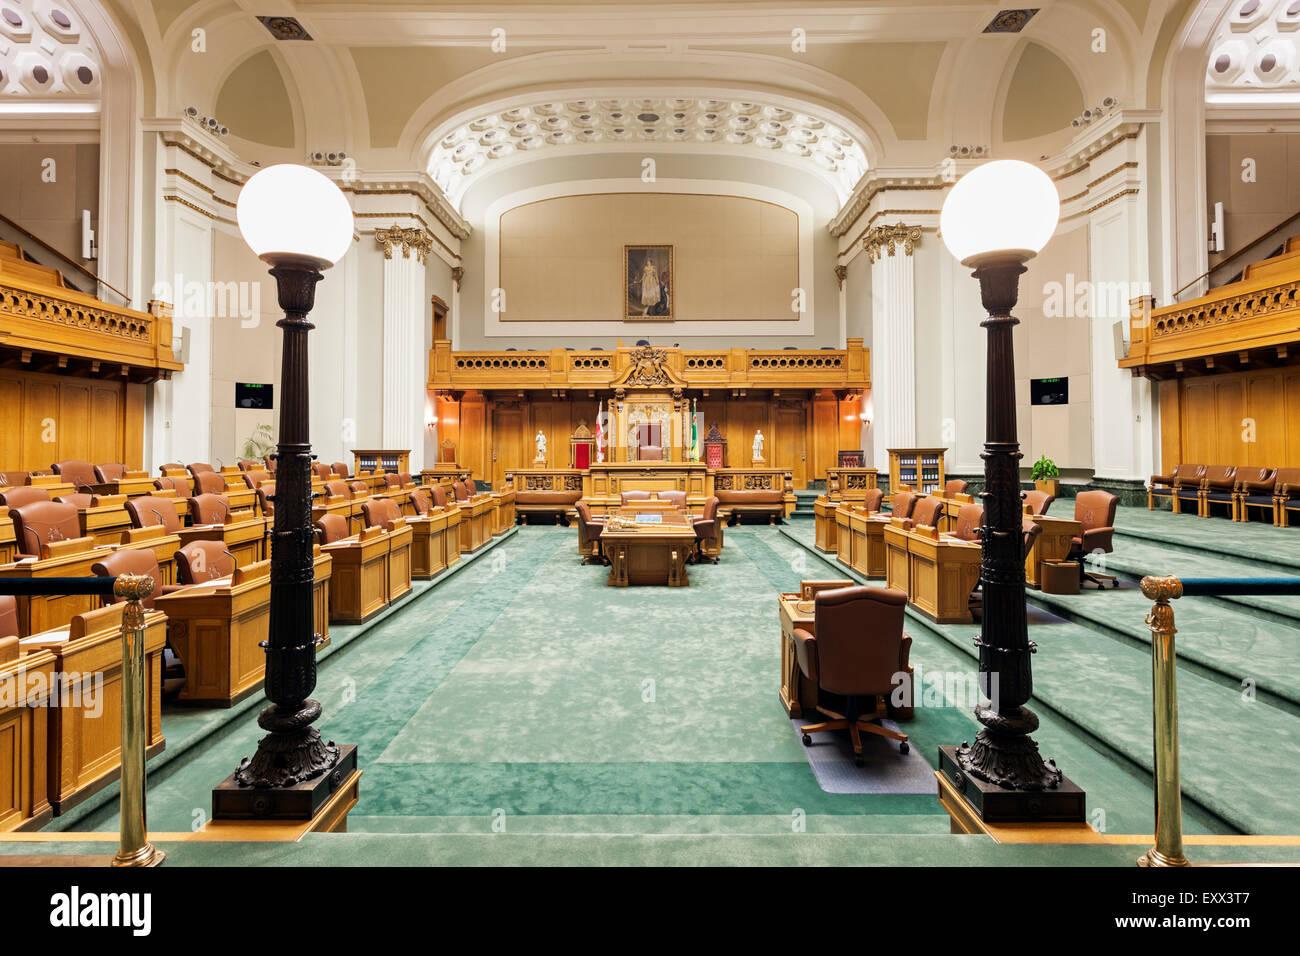 Interior of Saskatchewan Legislative Building - Stock Image